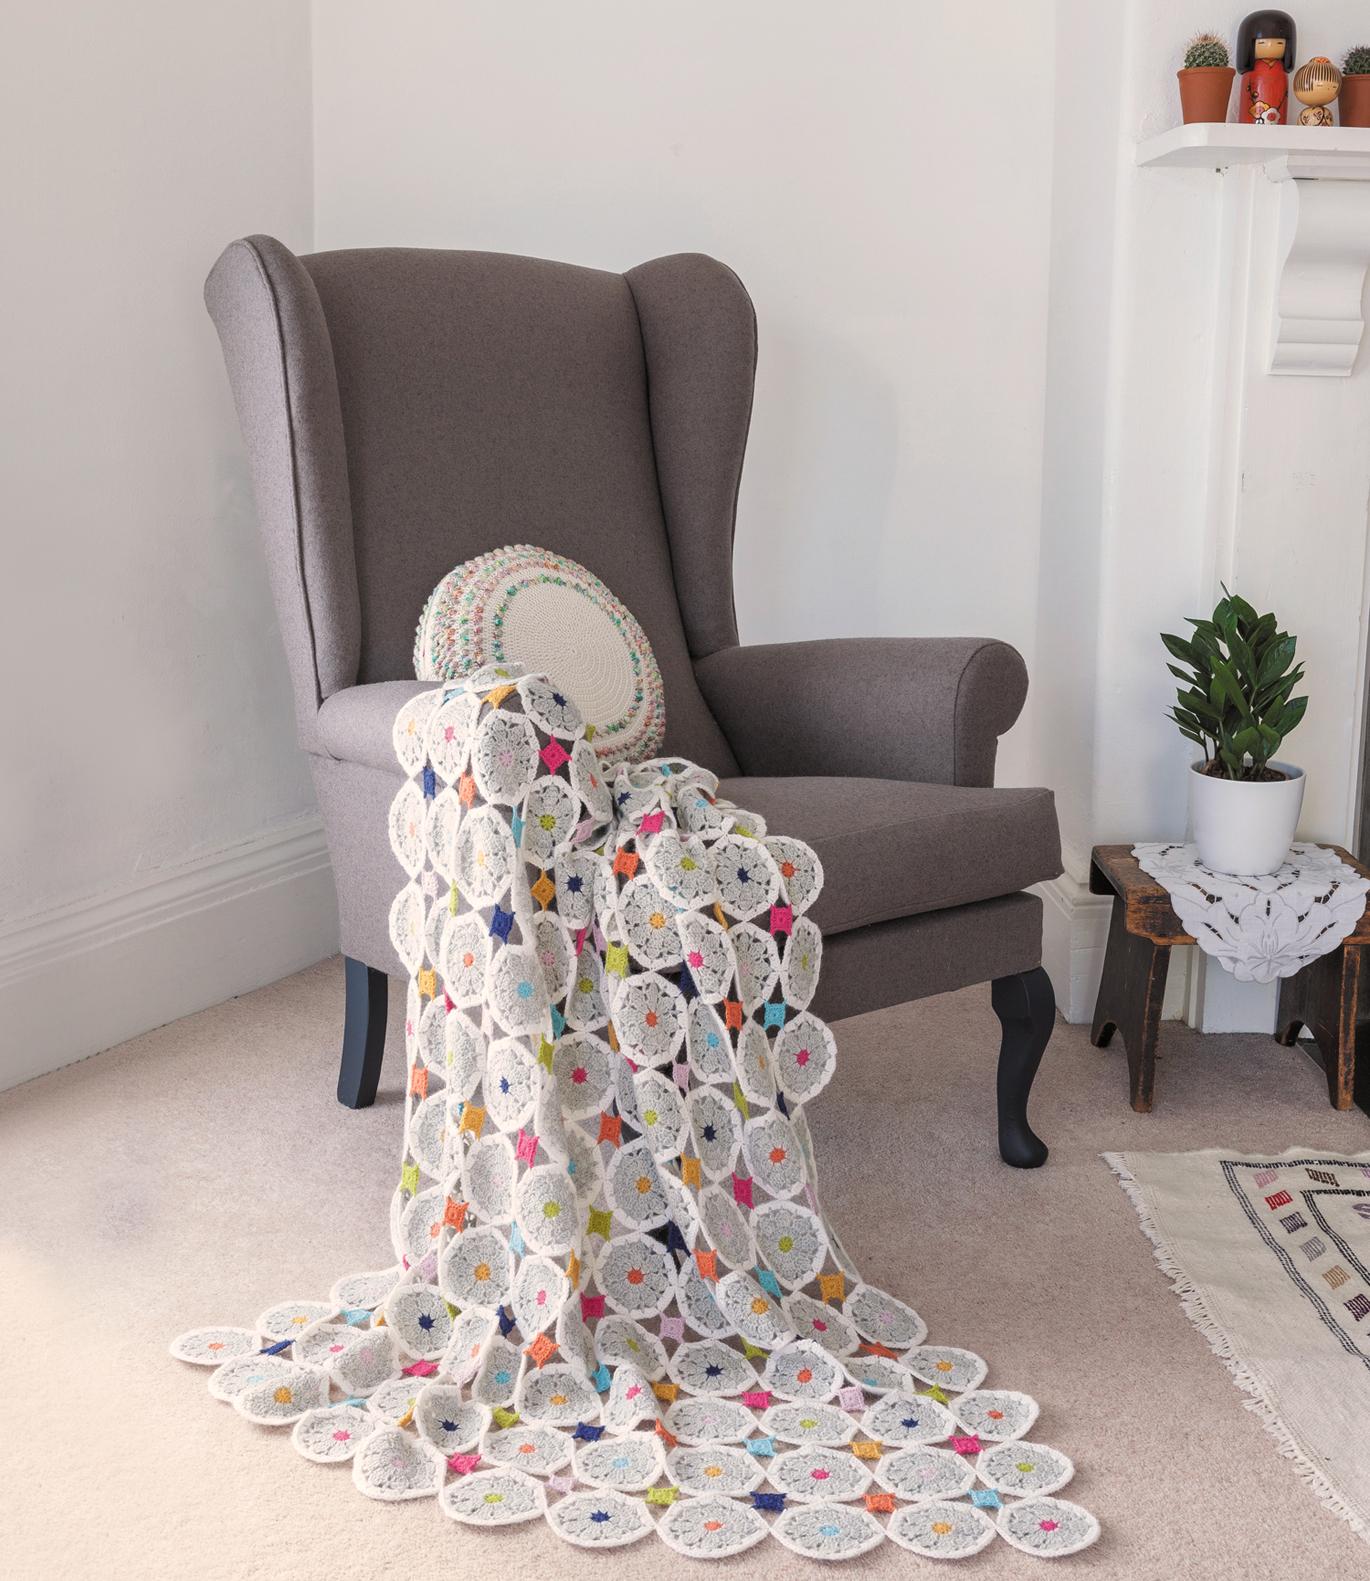 Daisy Dot Lap Blanket from Crochet Home by Emma Lamb